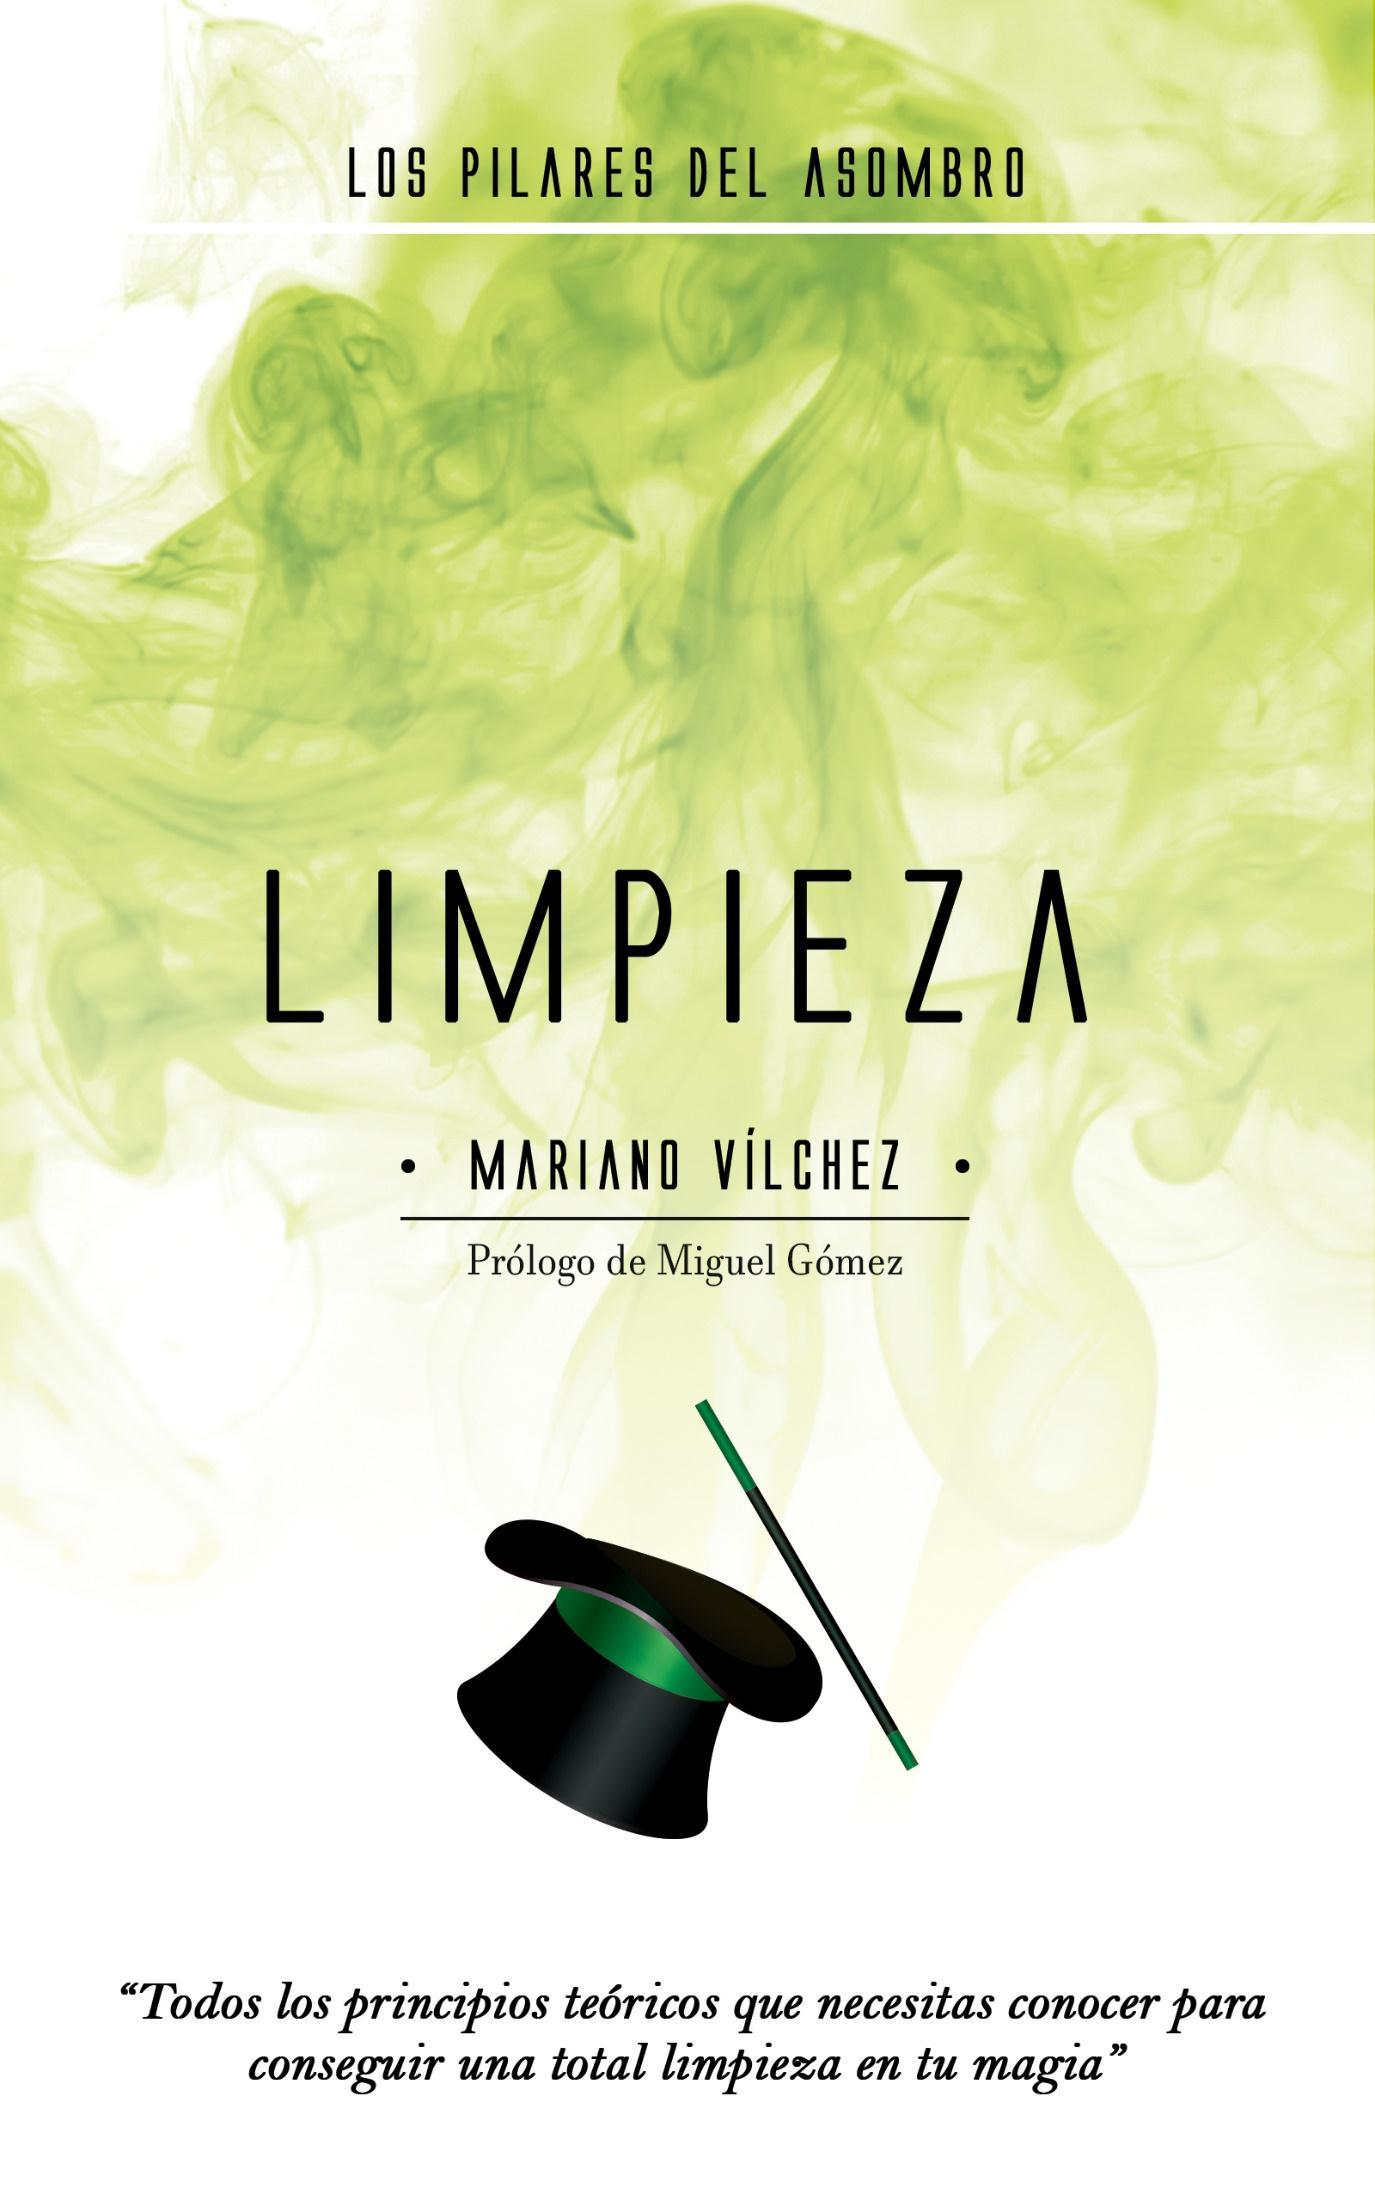 limpieza-mariano-vilchez-1375x2200   ilusionat.com